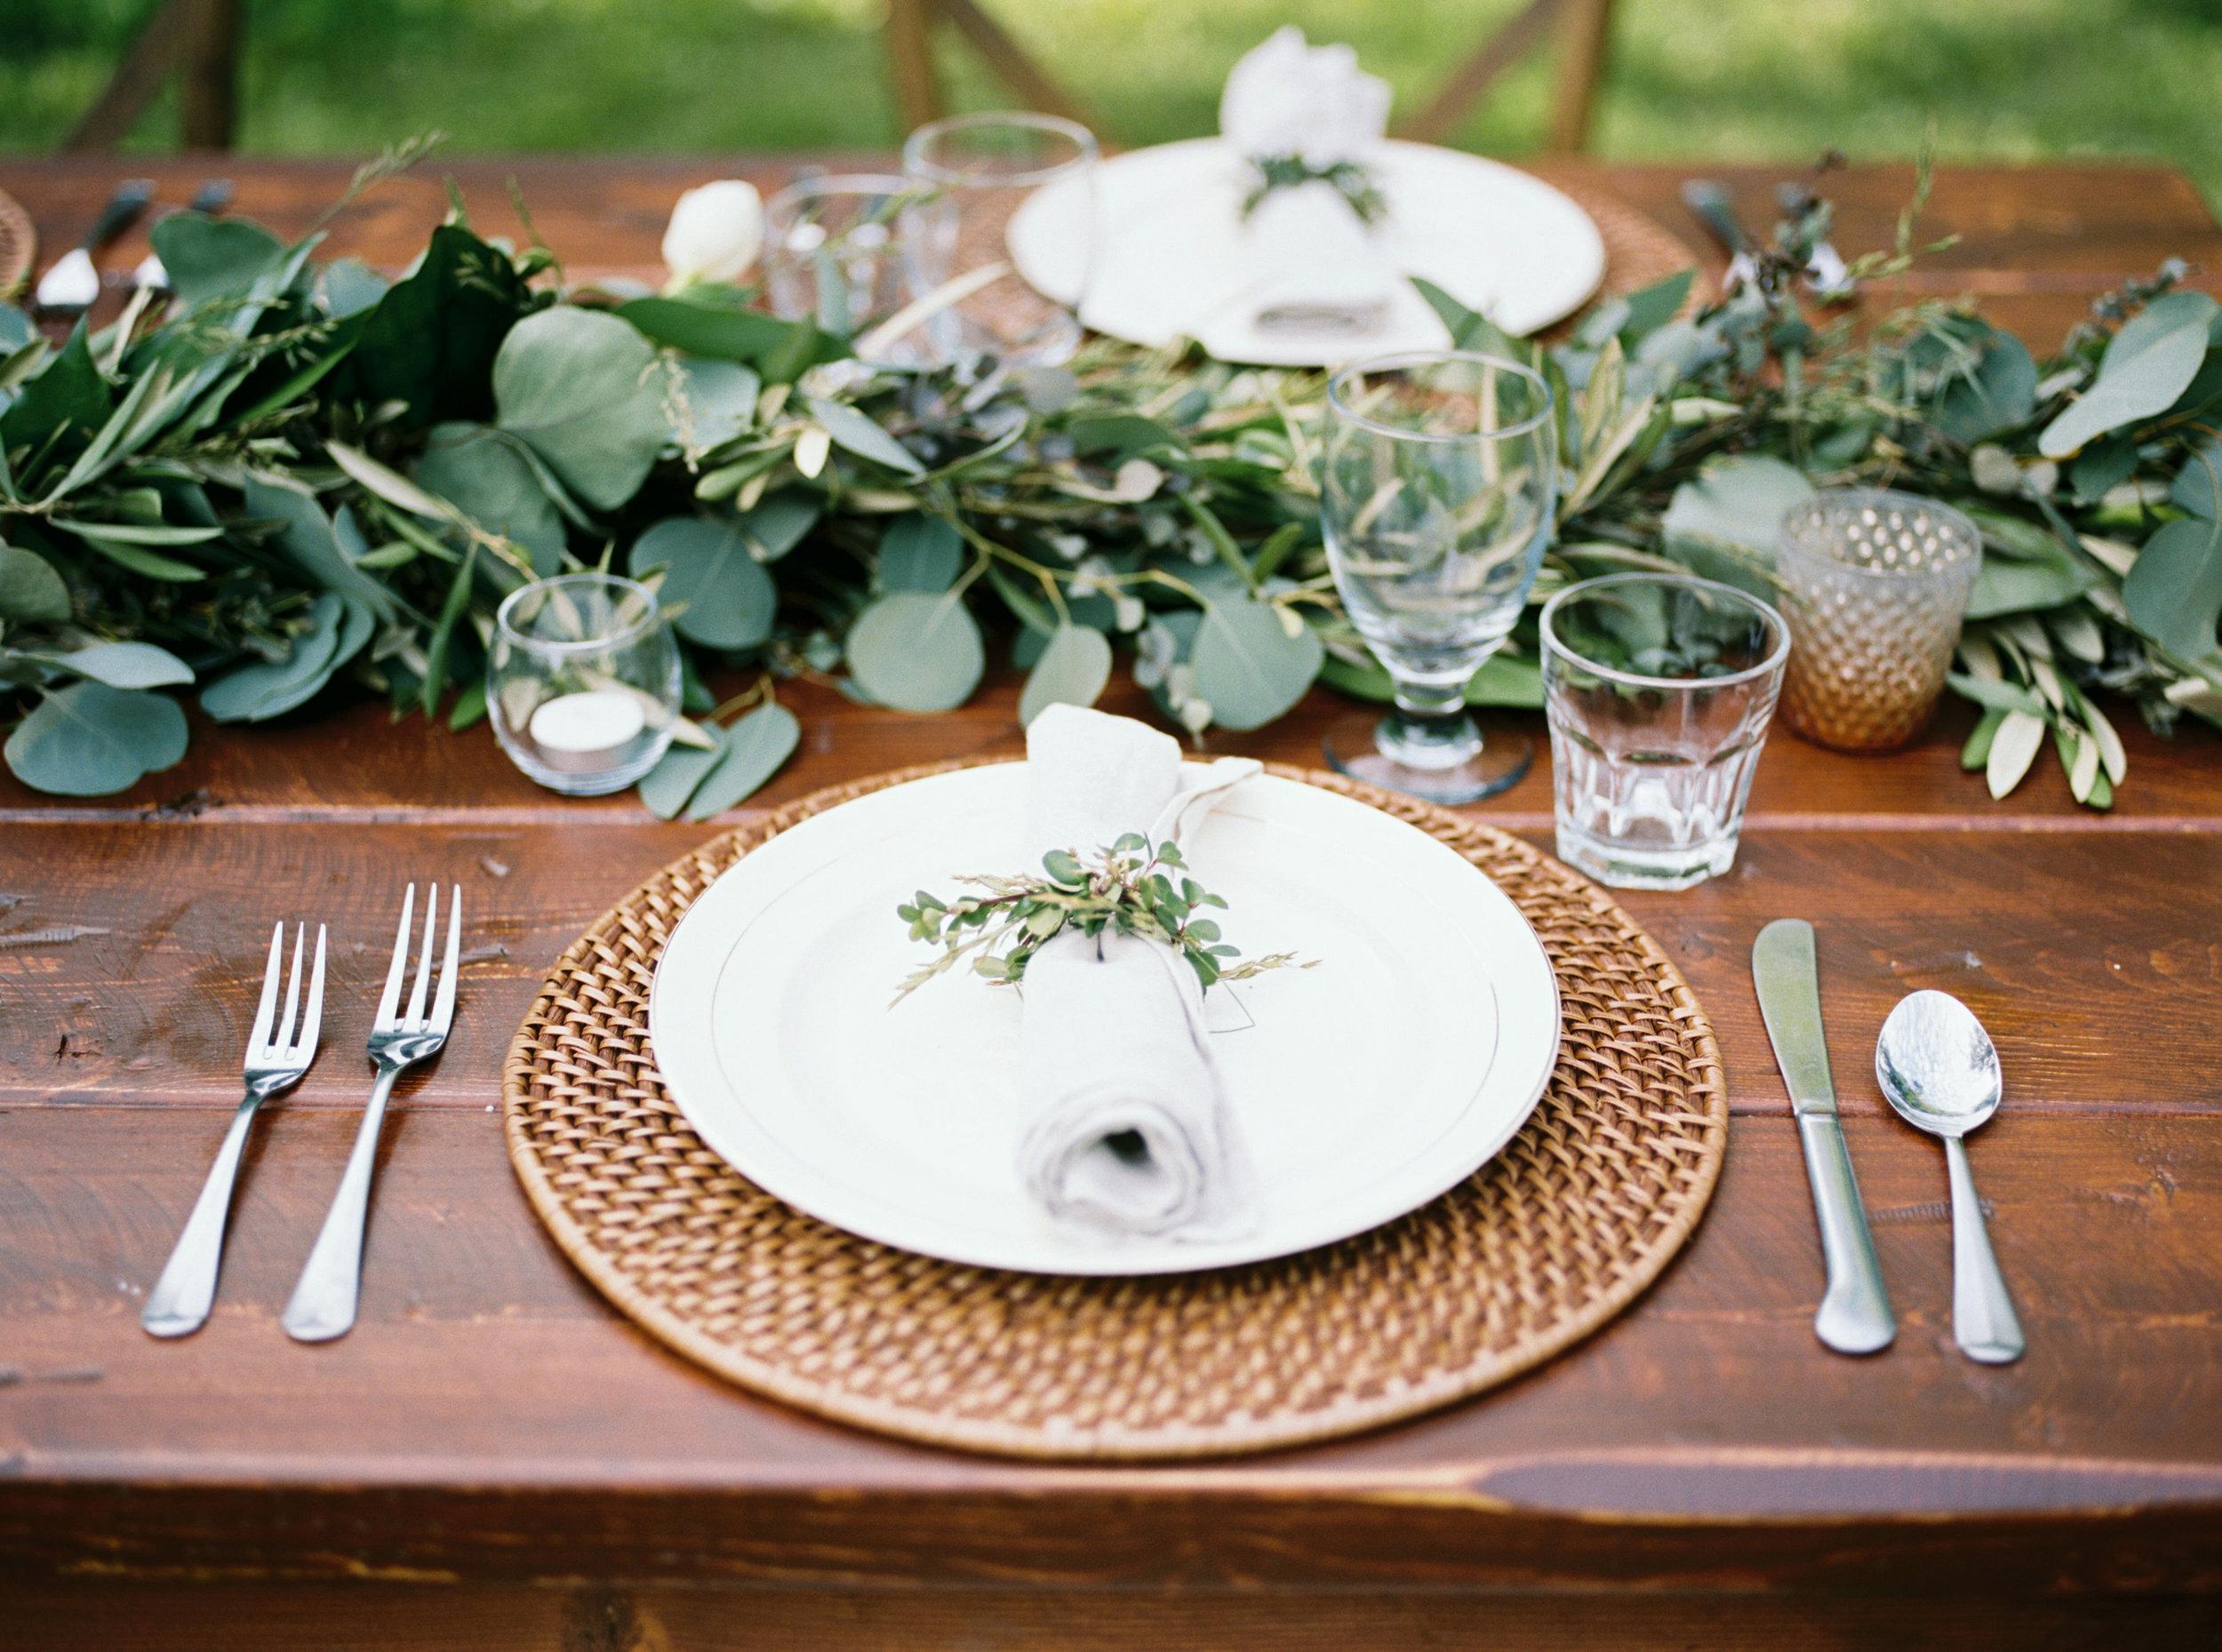 greenhouse-wedding-inspiration-by-laurelyn-savannah-photography-14.jpg